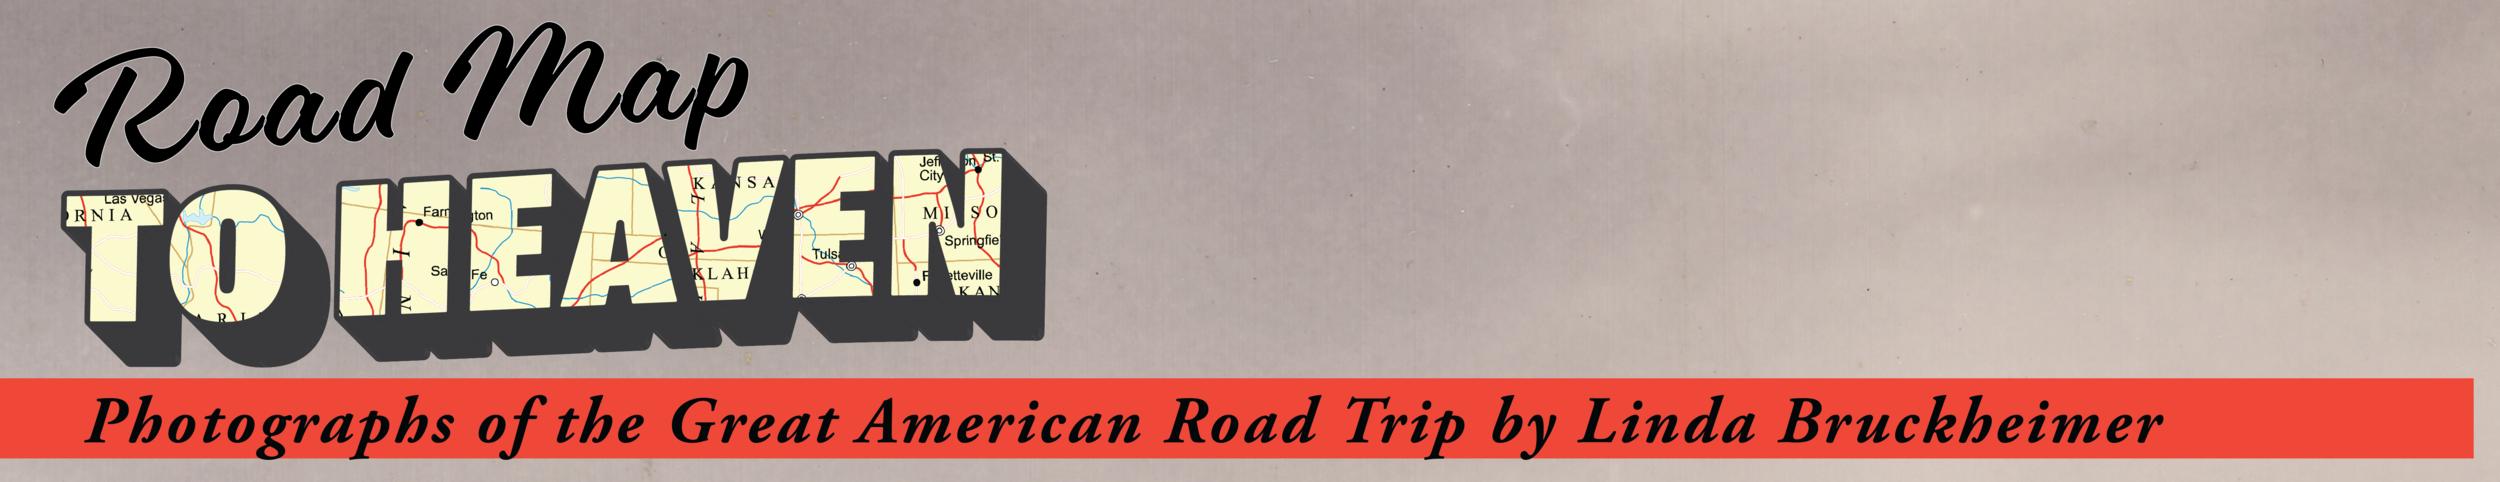 Linda Bruckheimer Roadmap to Heaven headerpng-05-05-05.png